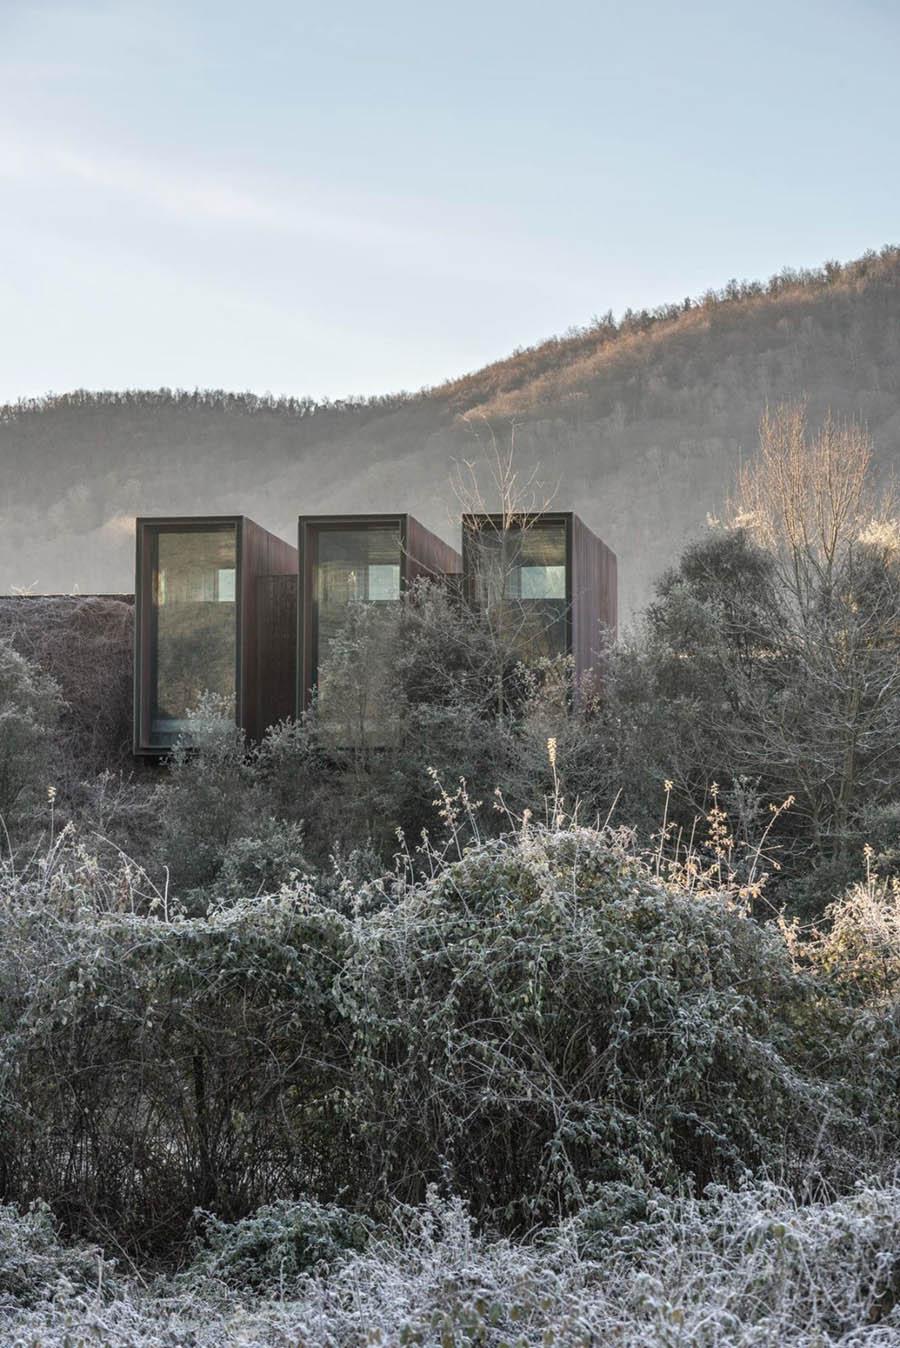 Horizon House by RCR Arquitectes